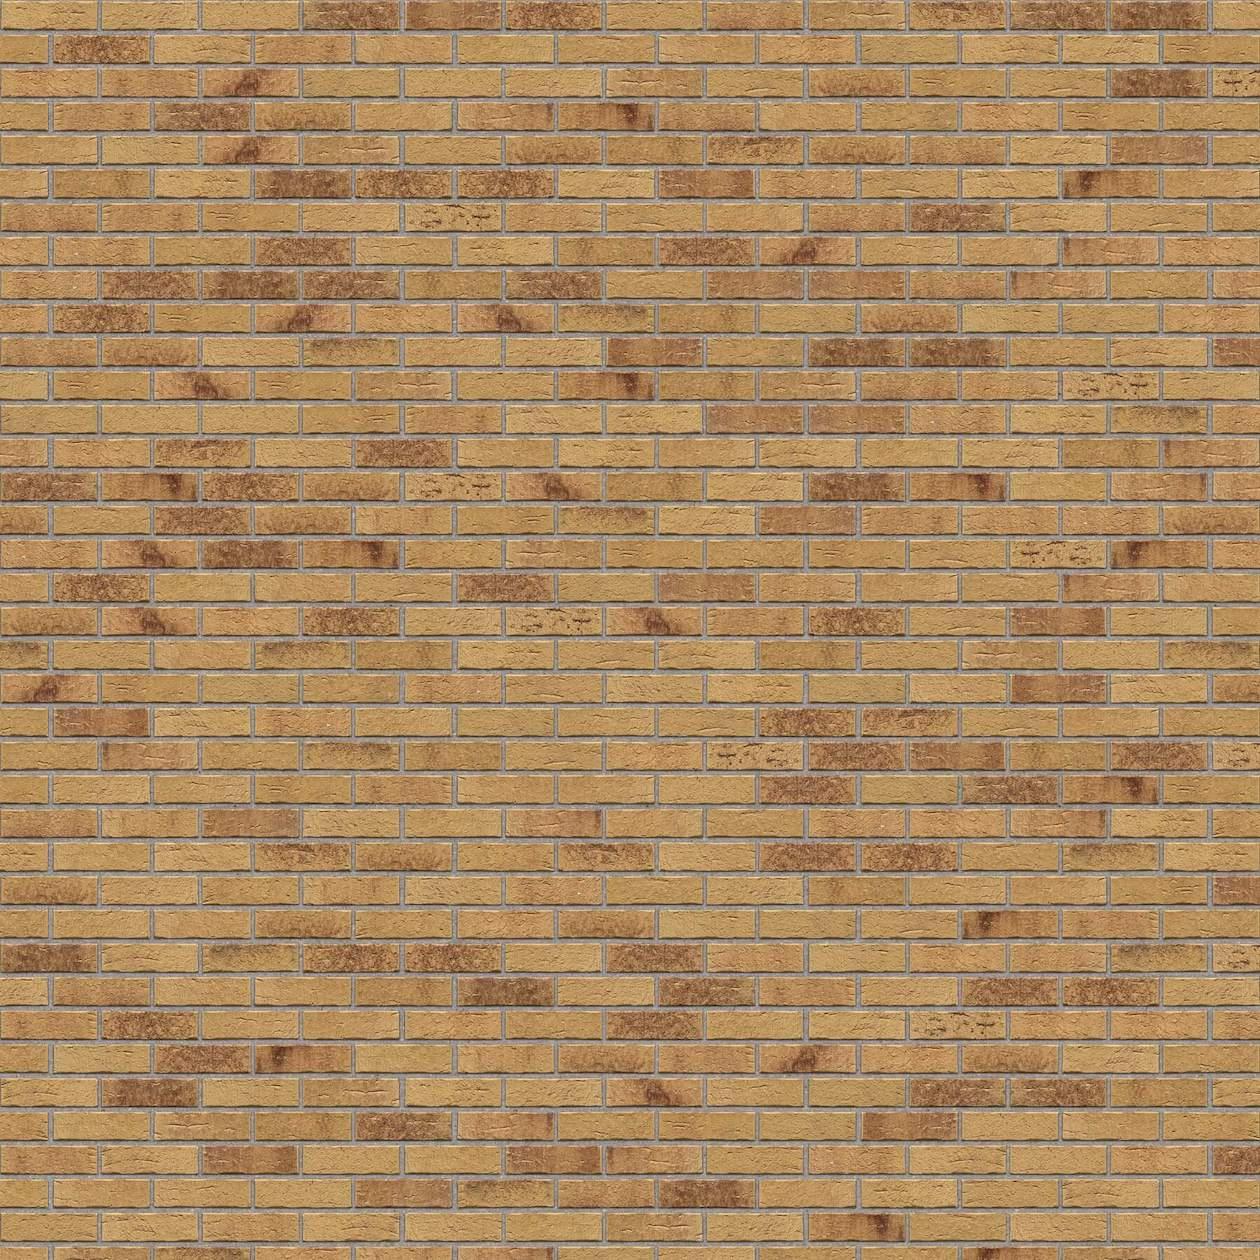 Puna-cigla-FeldHaus-Klinker-brick-house-nf-k-688-Siva Fuga